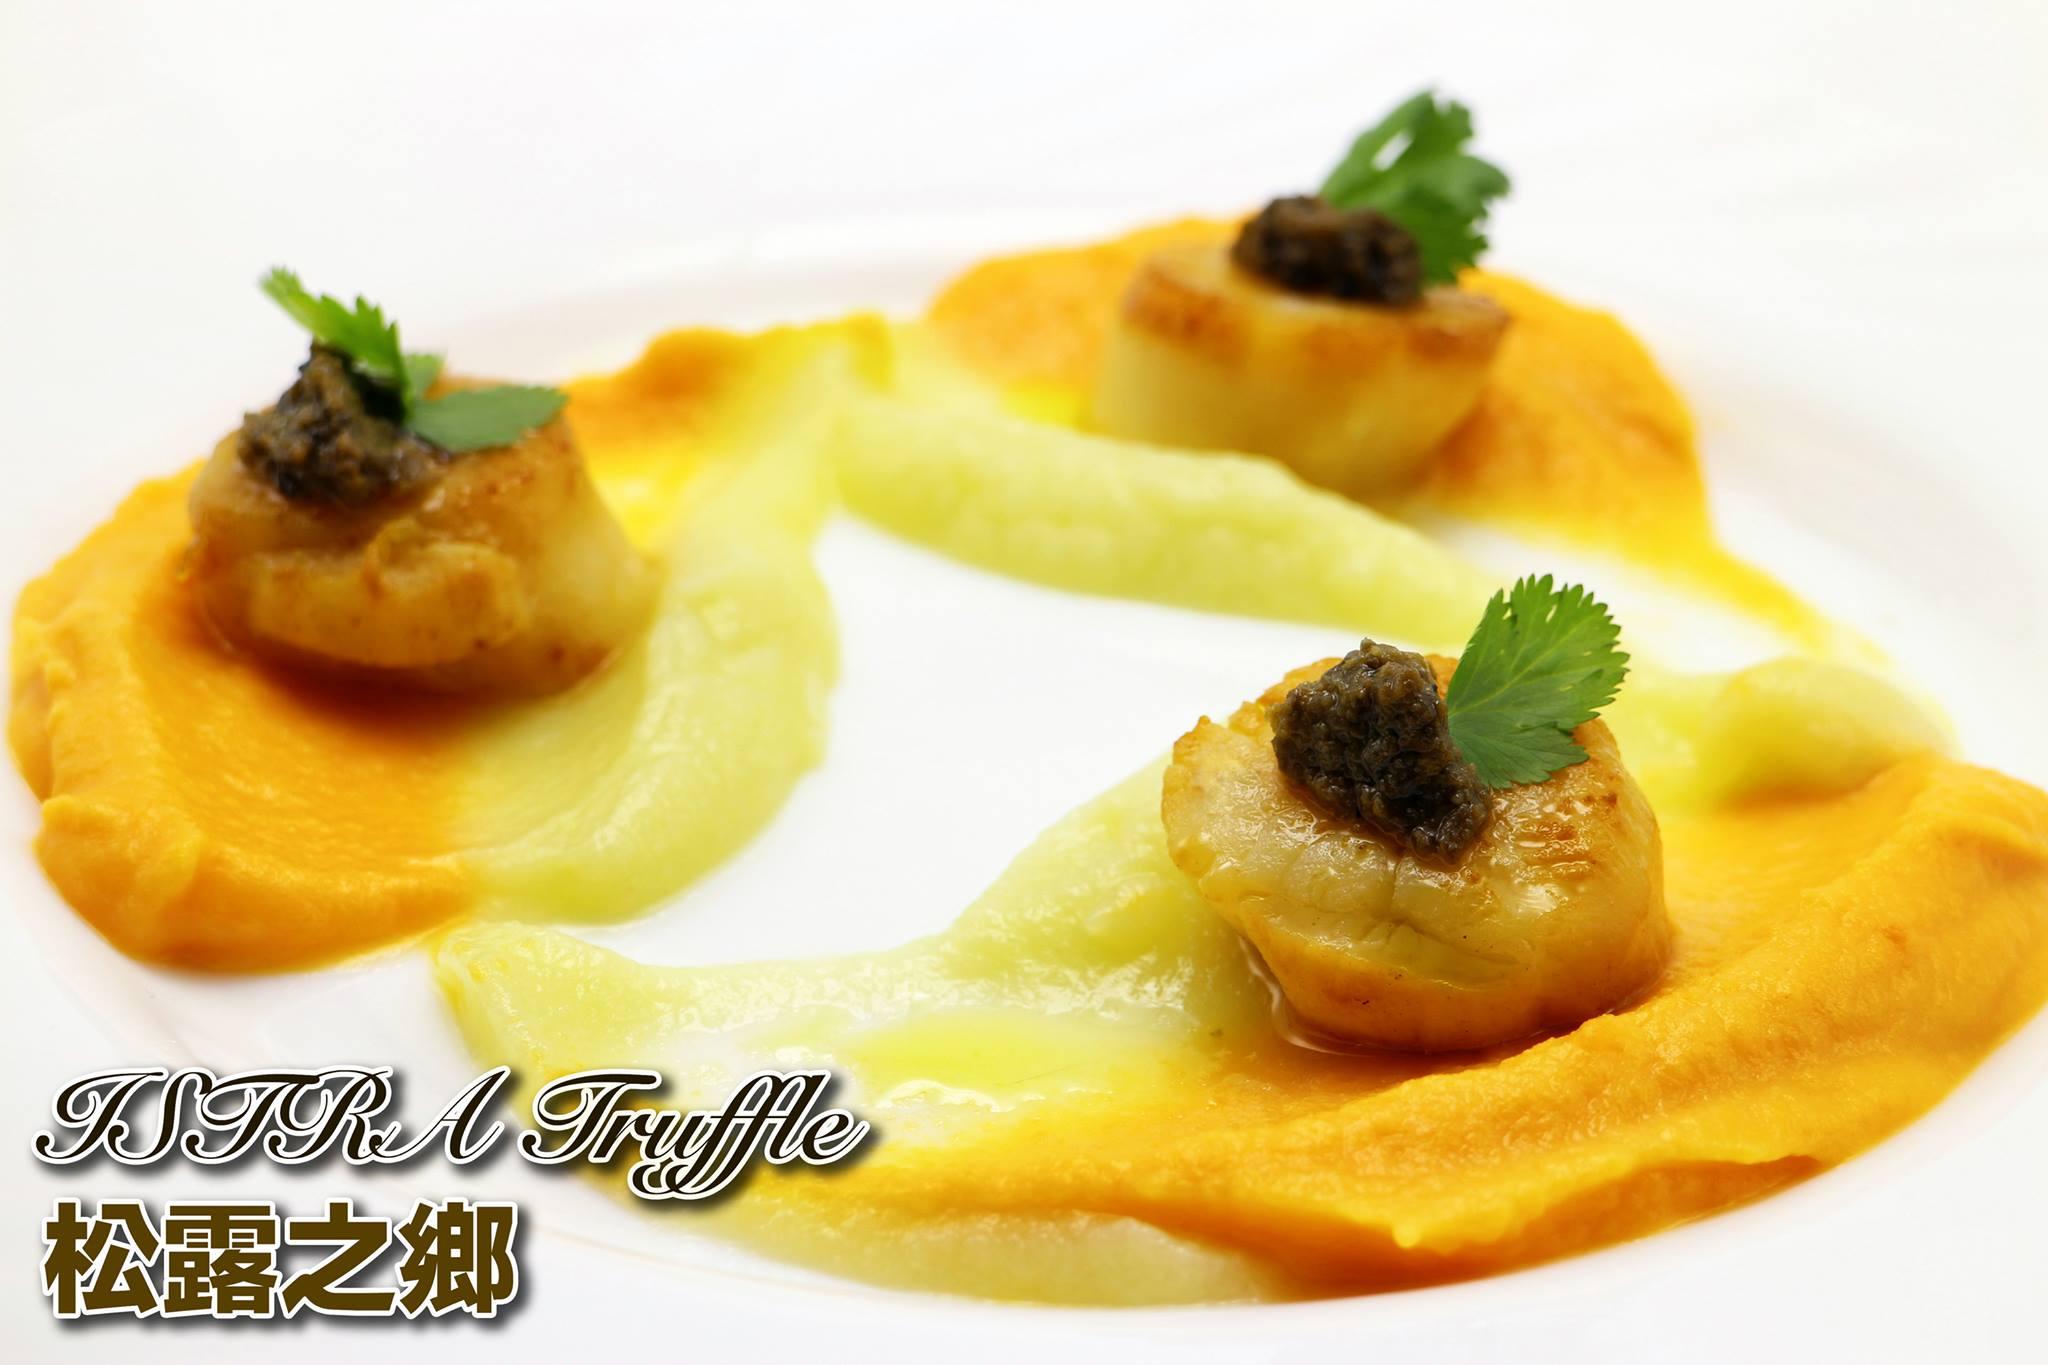 Scallops with Truffe Sauce